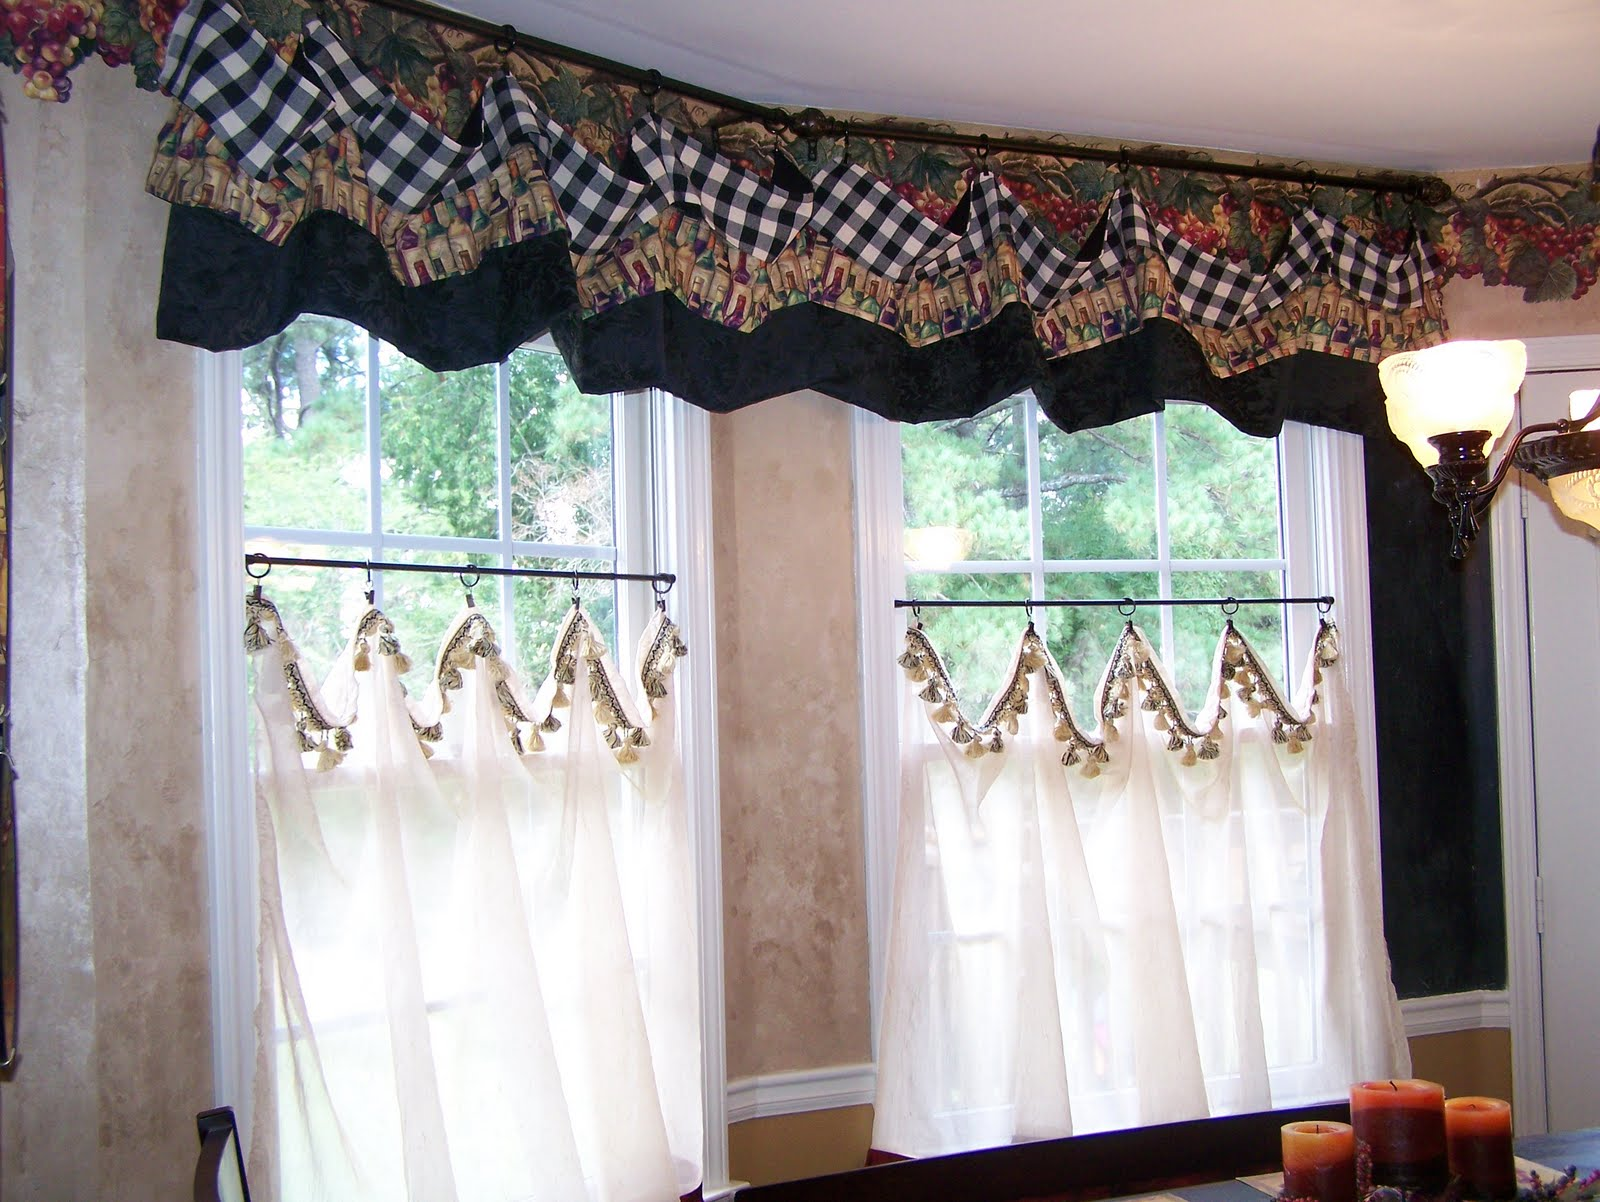 kitchen valances for windows sheet vinyl flooring curtains and patchwork on pinterest